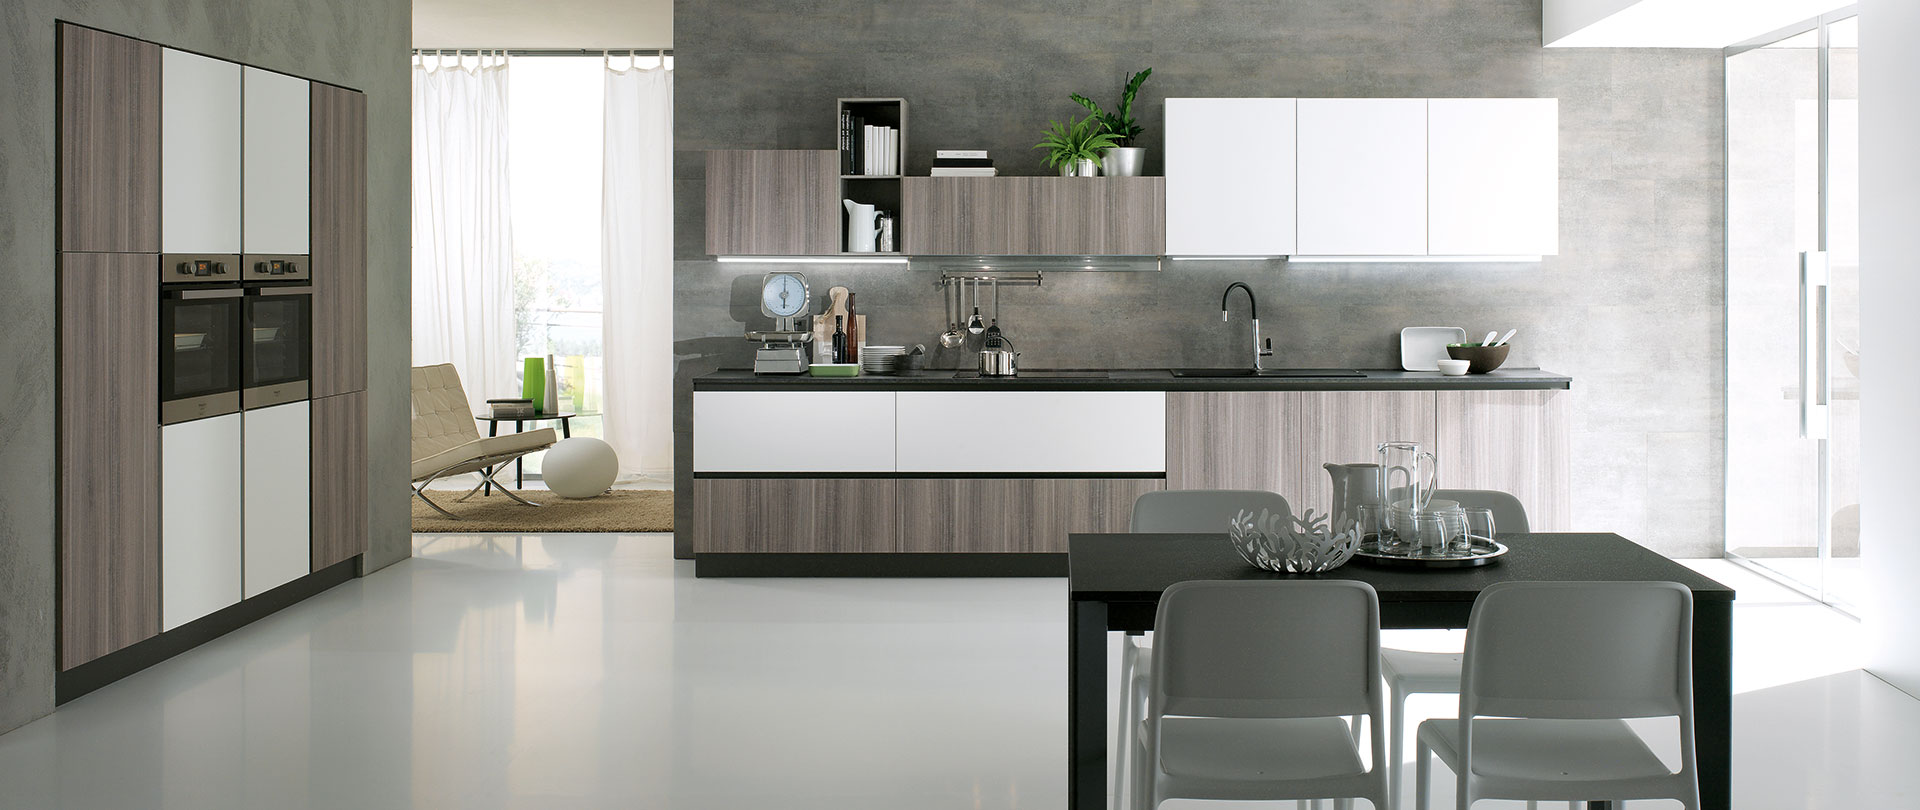 evo-cucina-agora-cenere-stone_seta-bianco-opaco